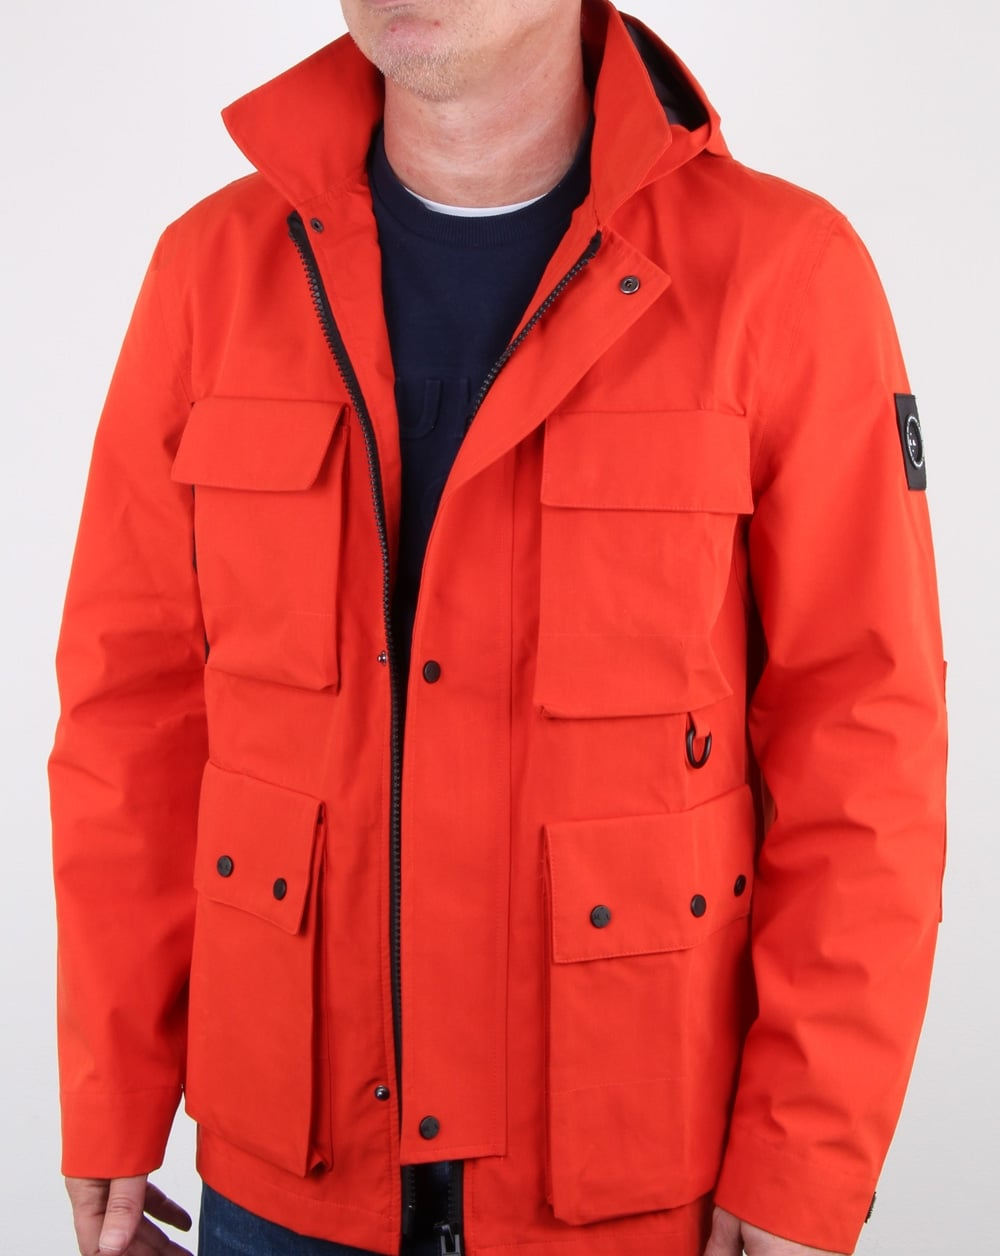 Best Buy Military Discount >> Marshall Artist 3l Bonded Field Jacket Orange, Mens, Jacket, Coat,Hood